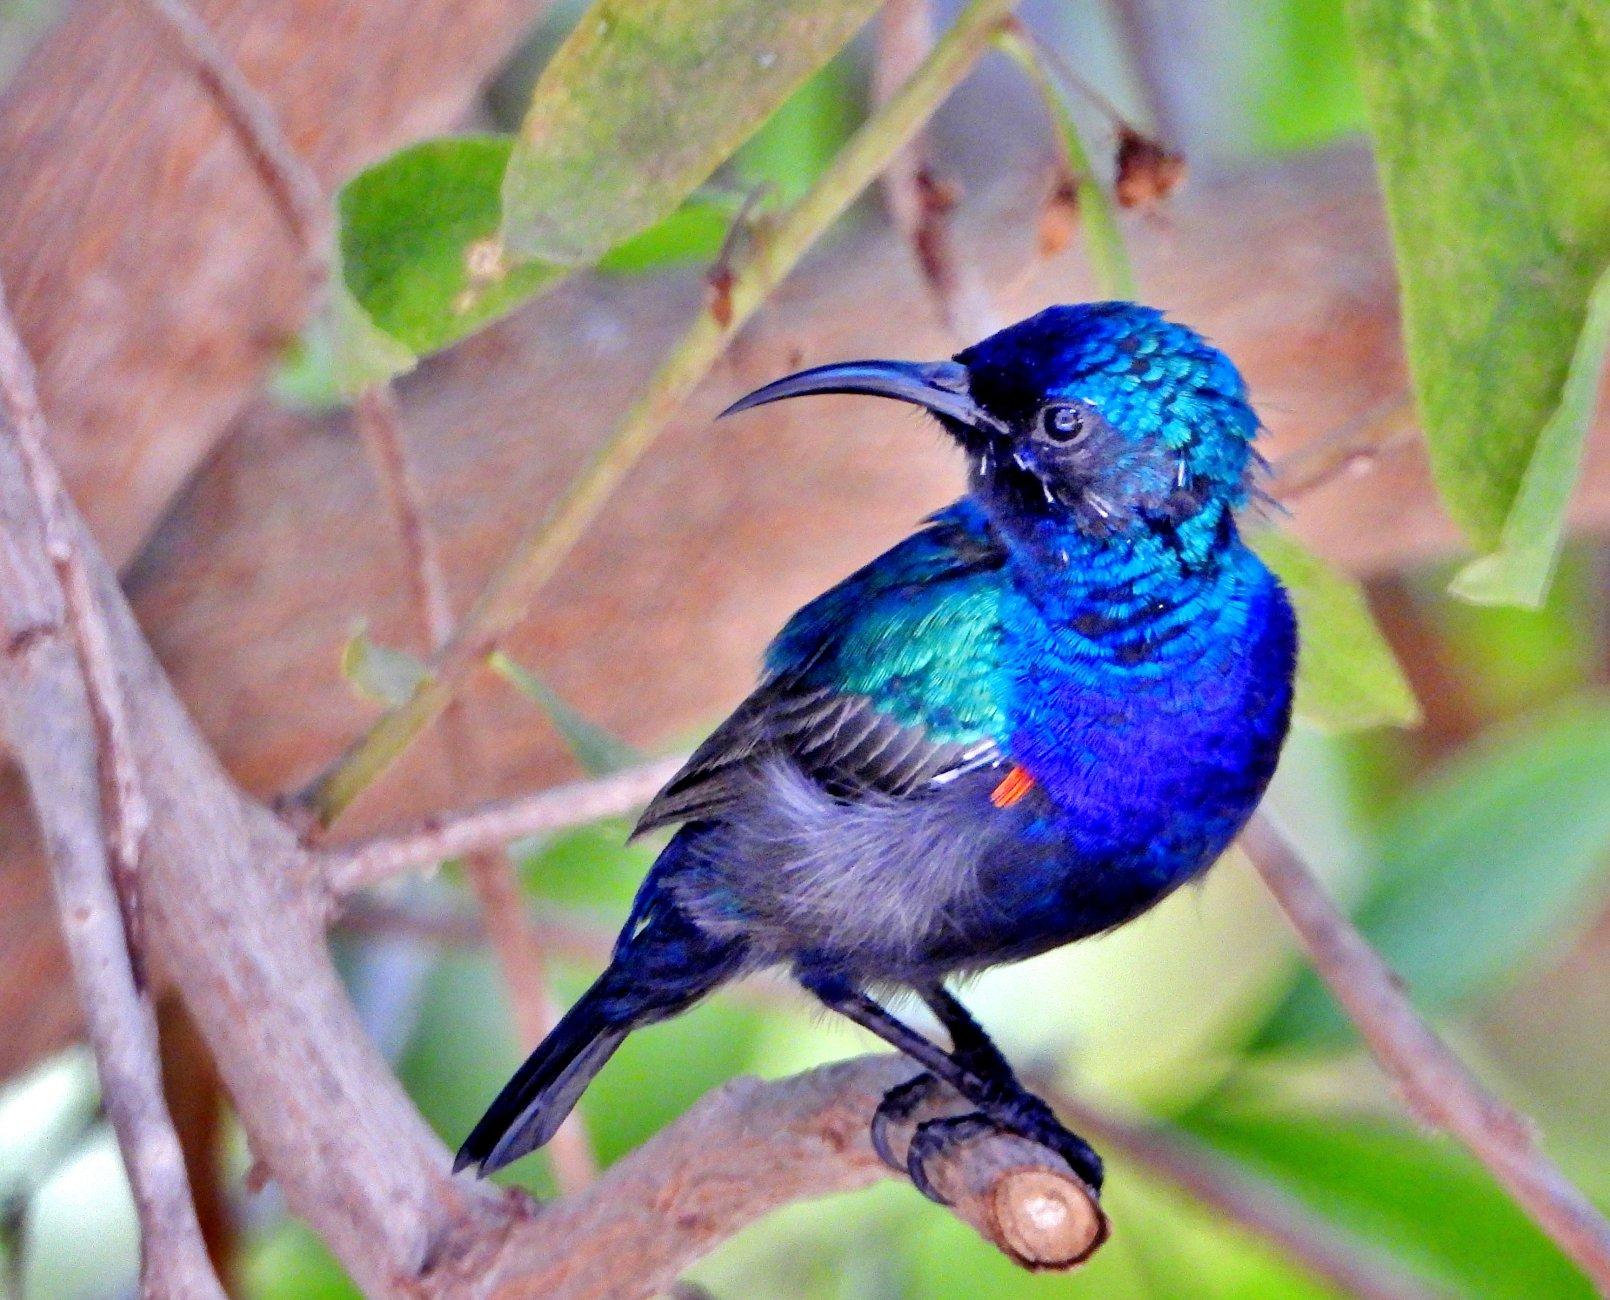 Bird with Indigo color